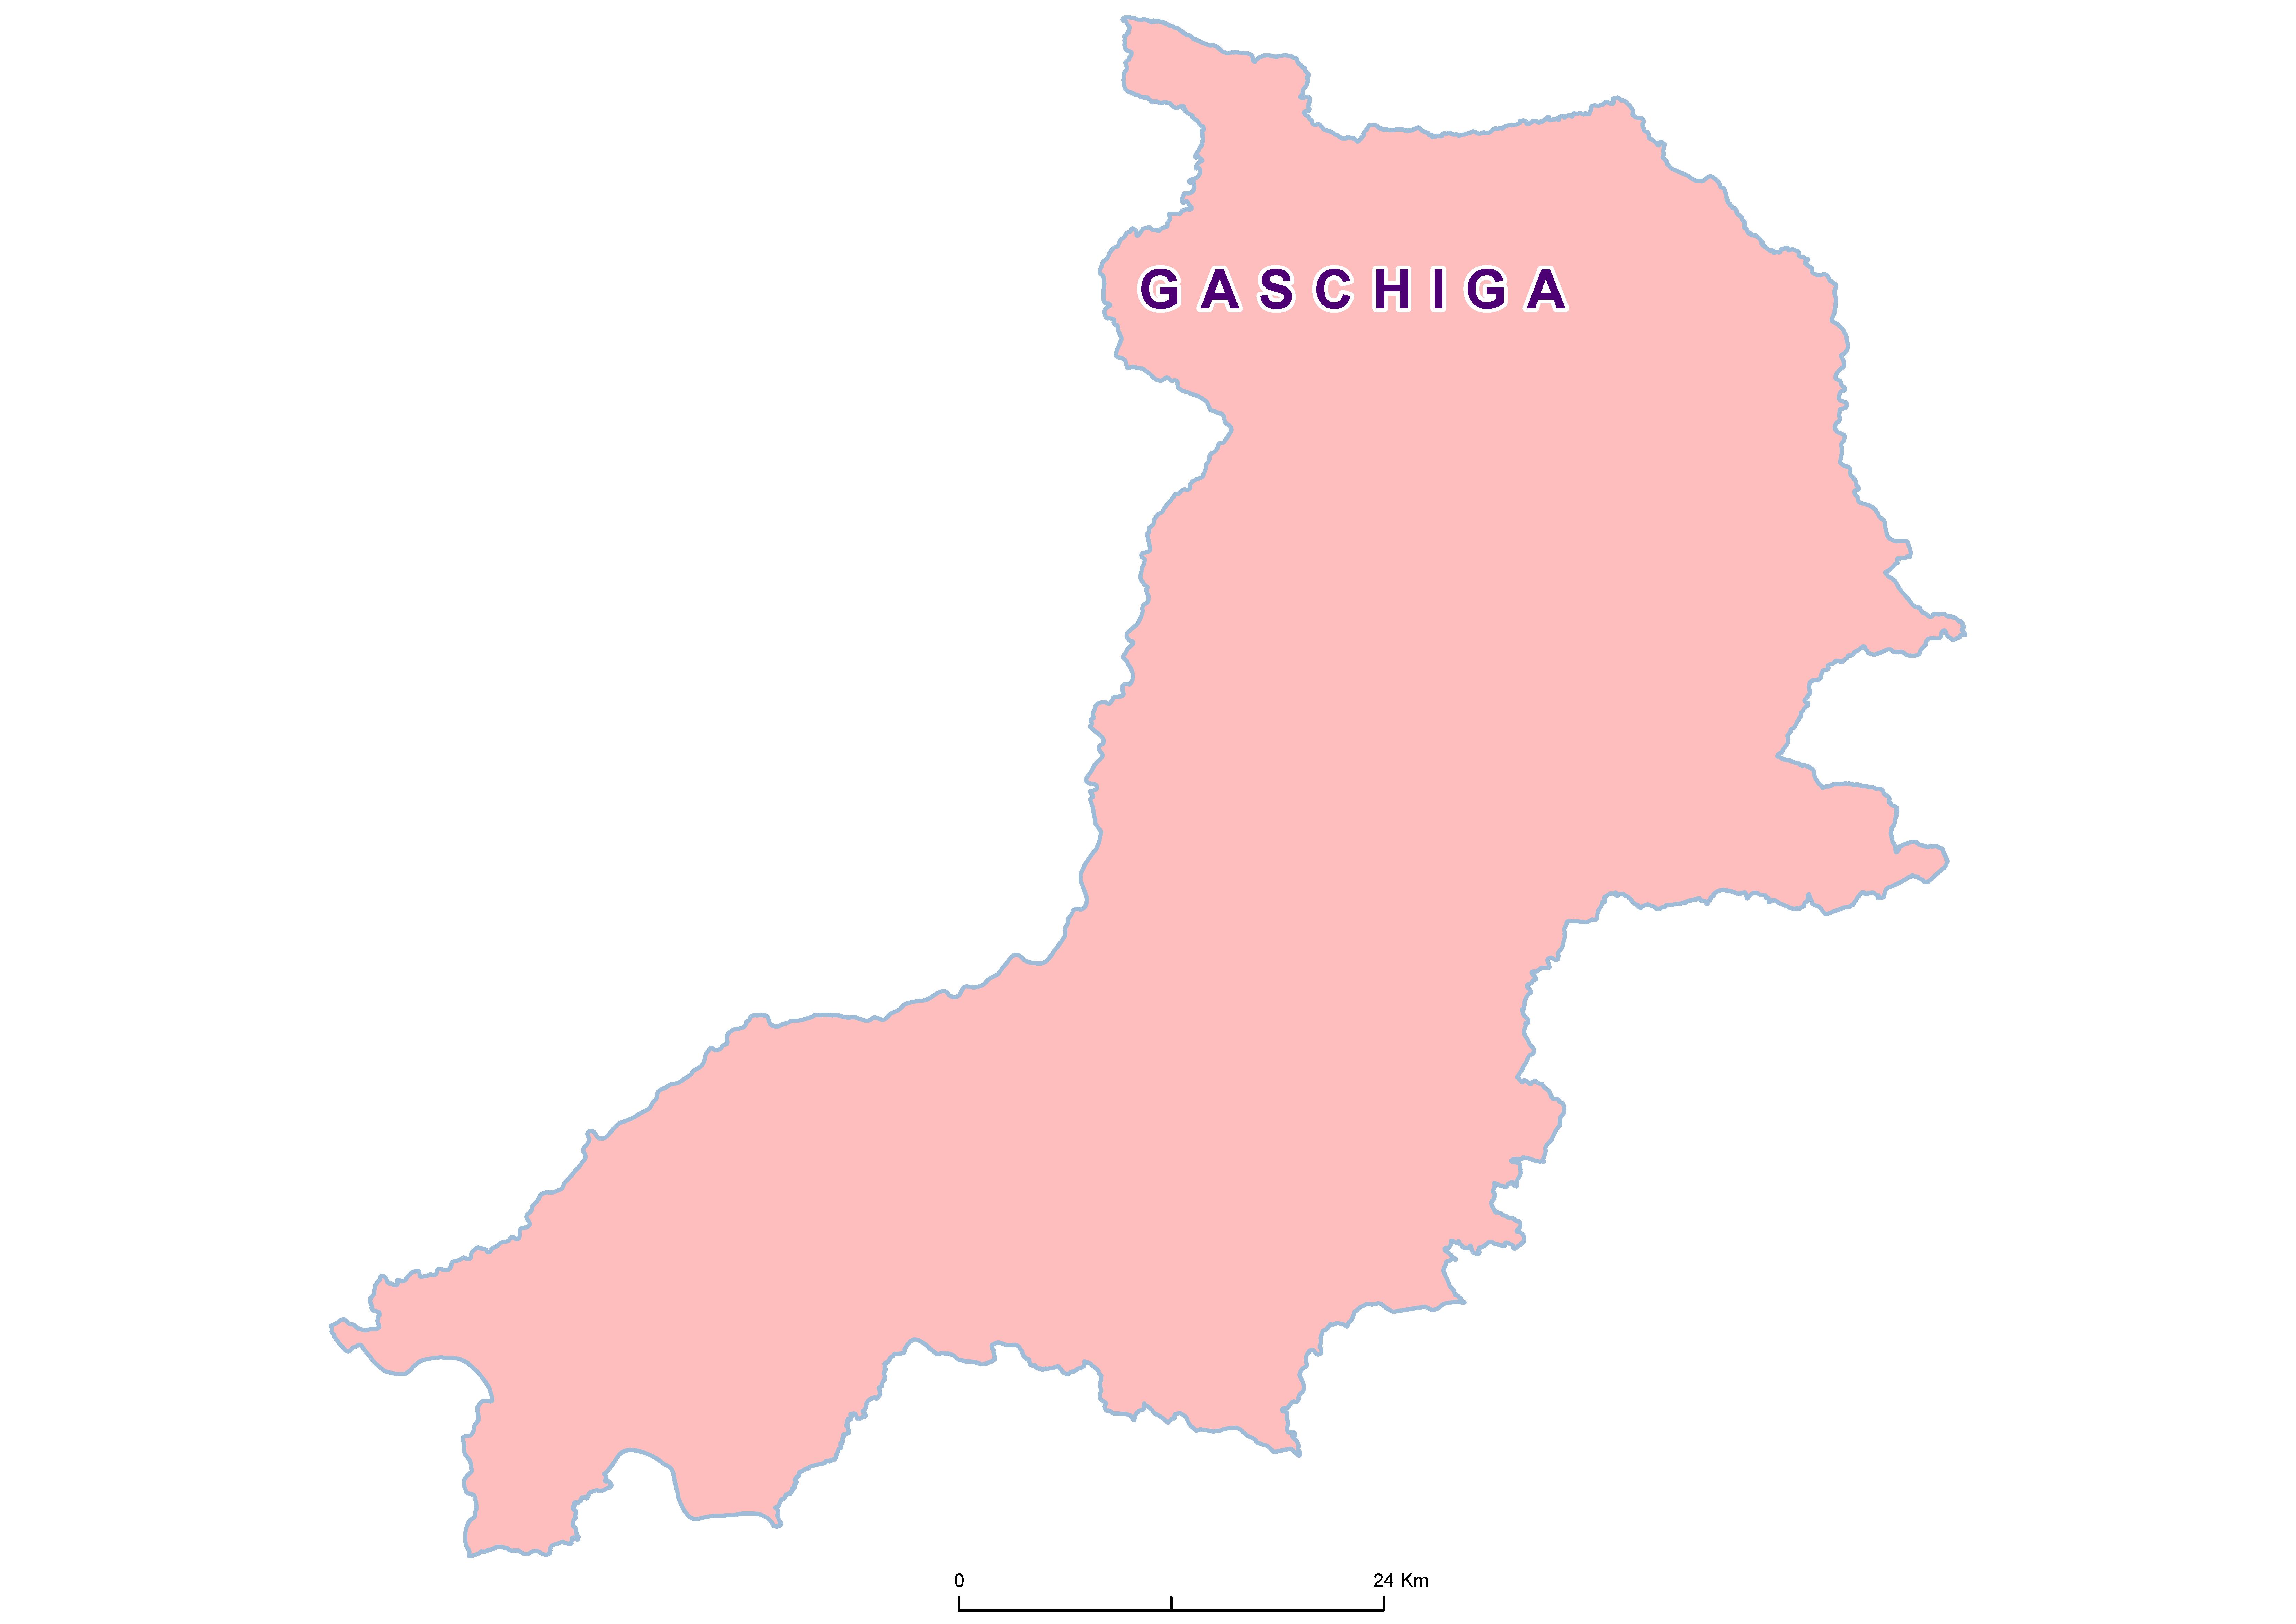 Gaschiga Mean SCH 20100001